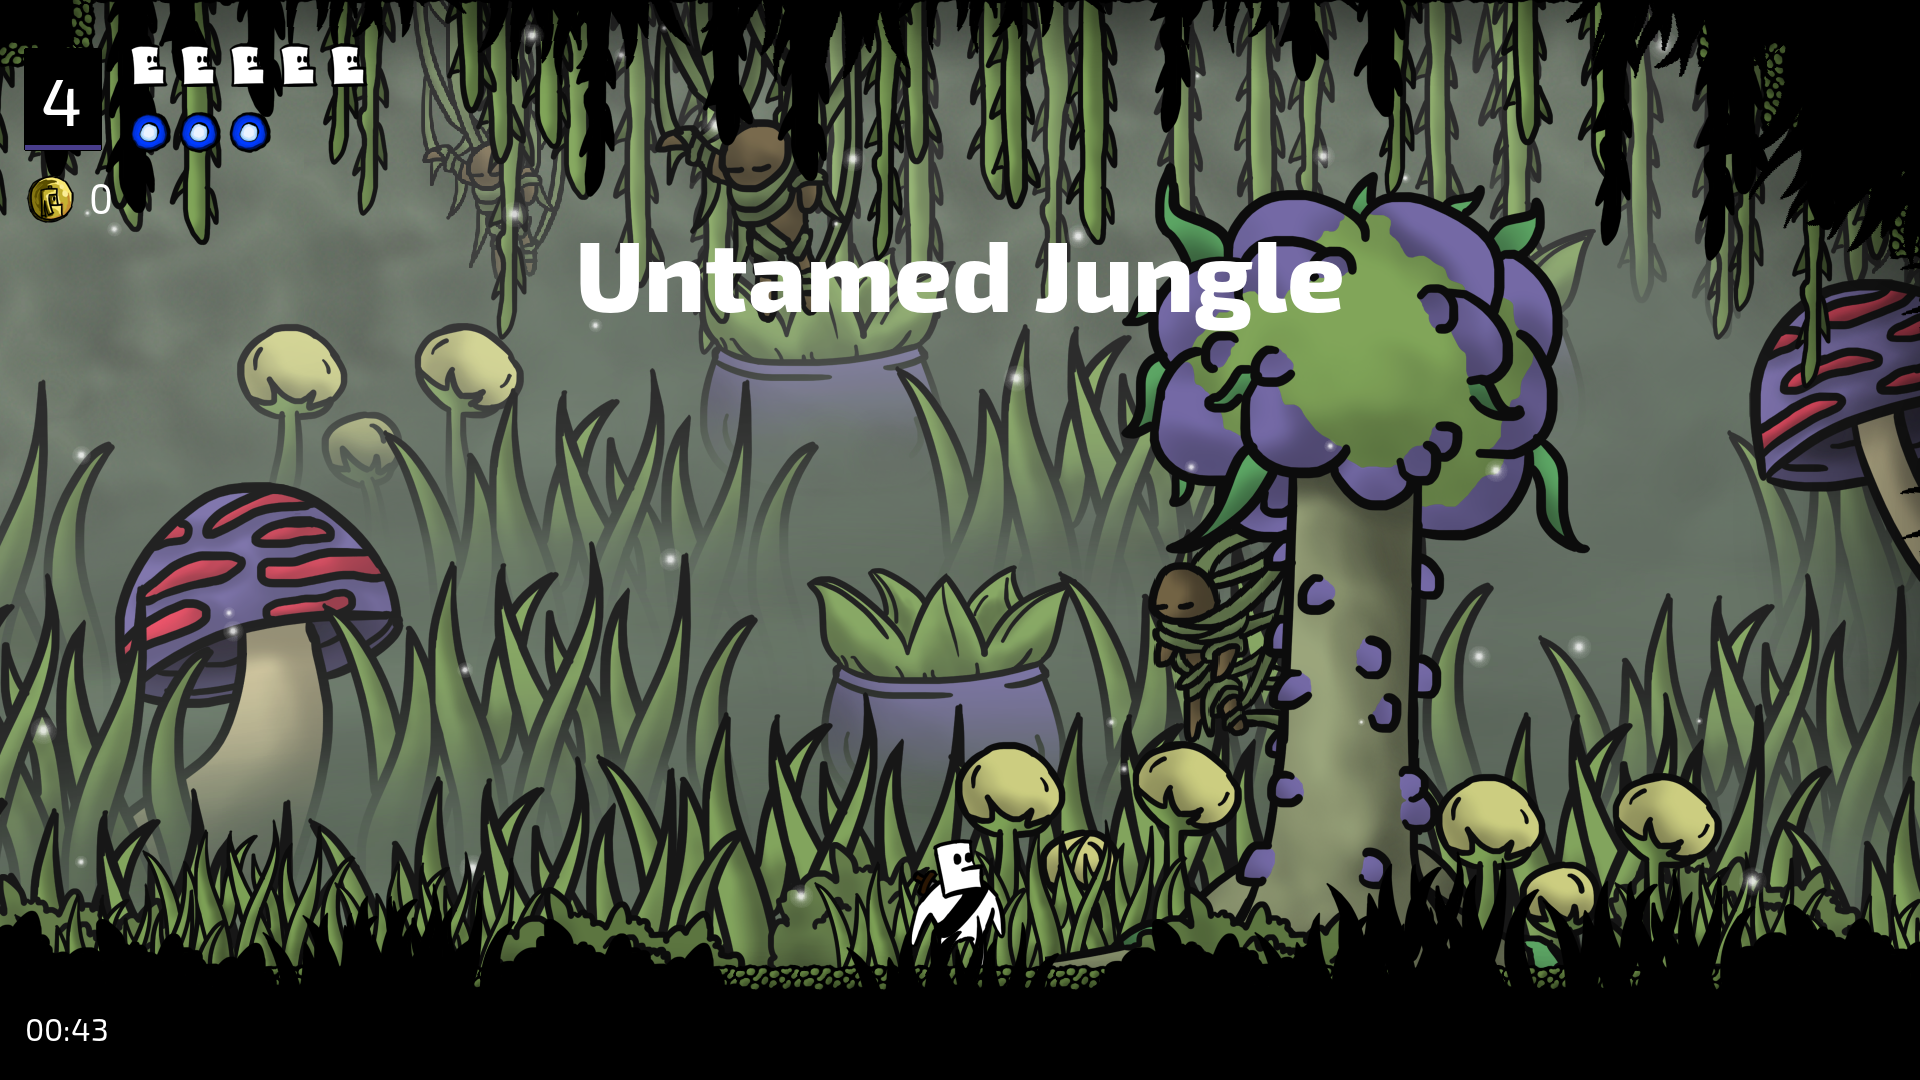 Untamed Jungle